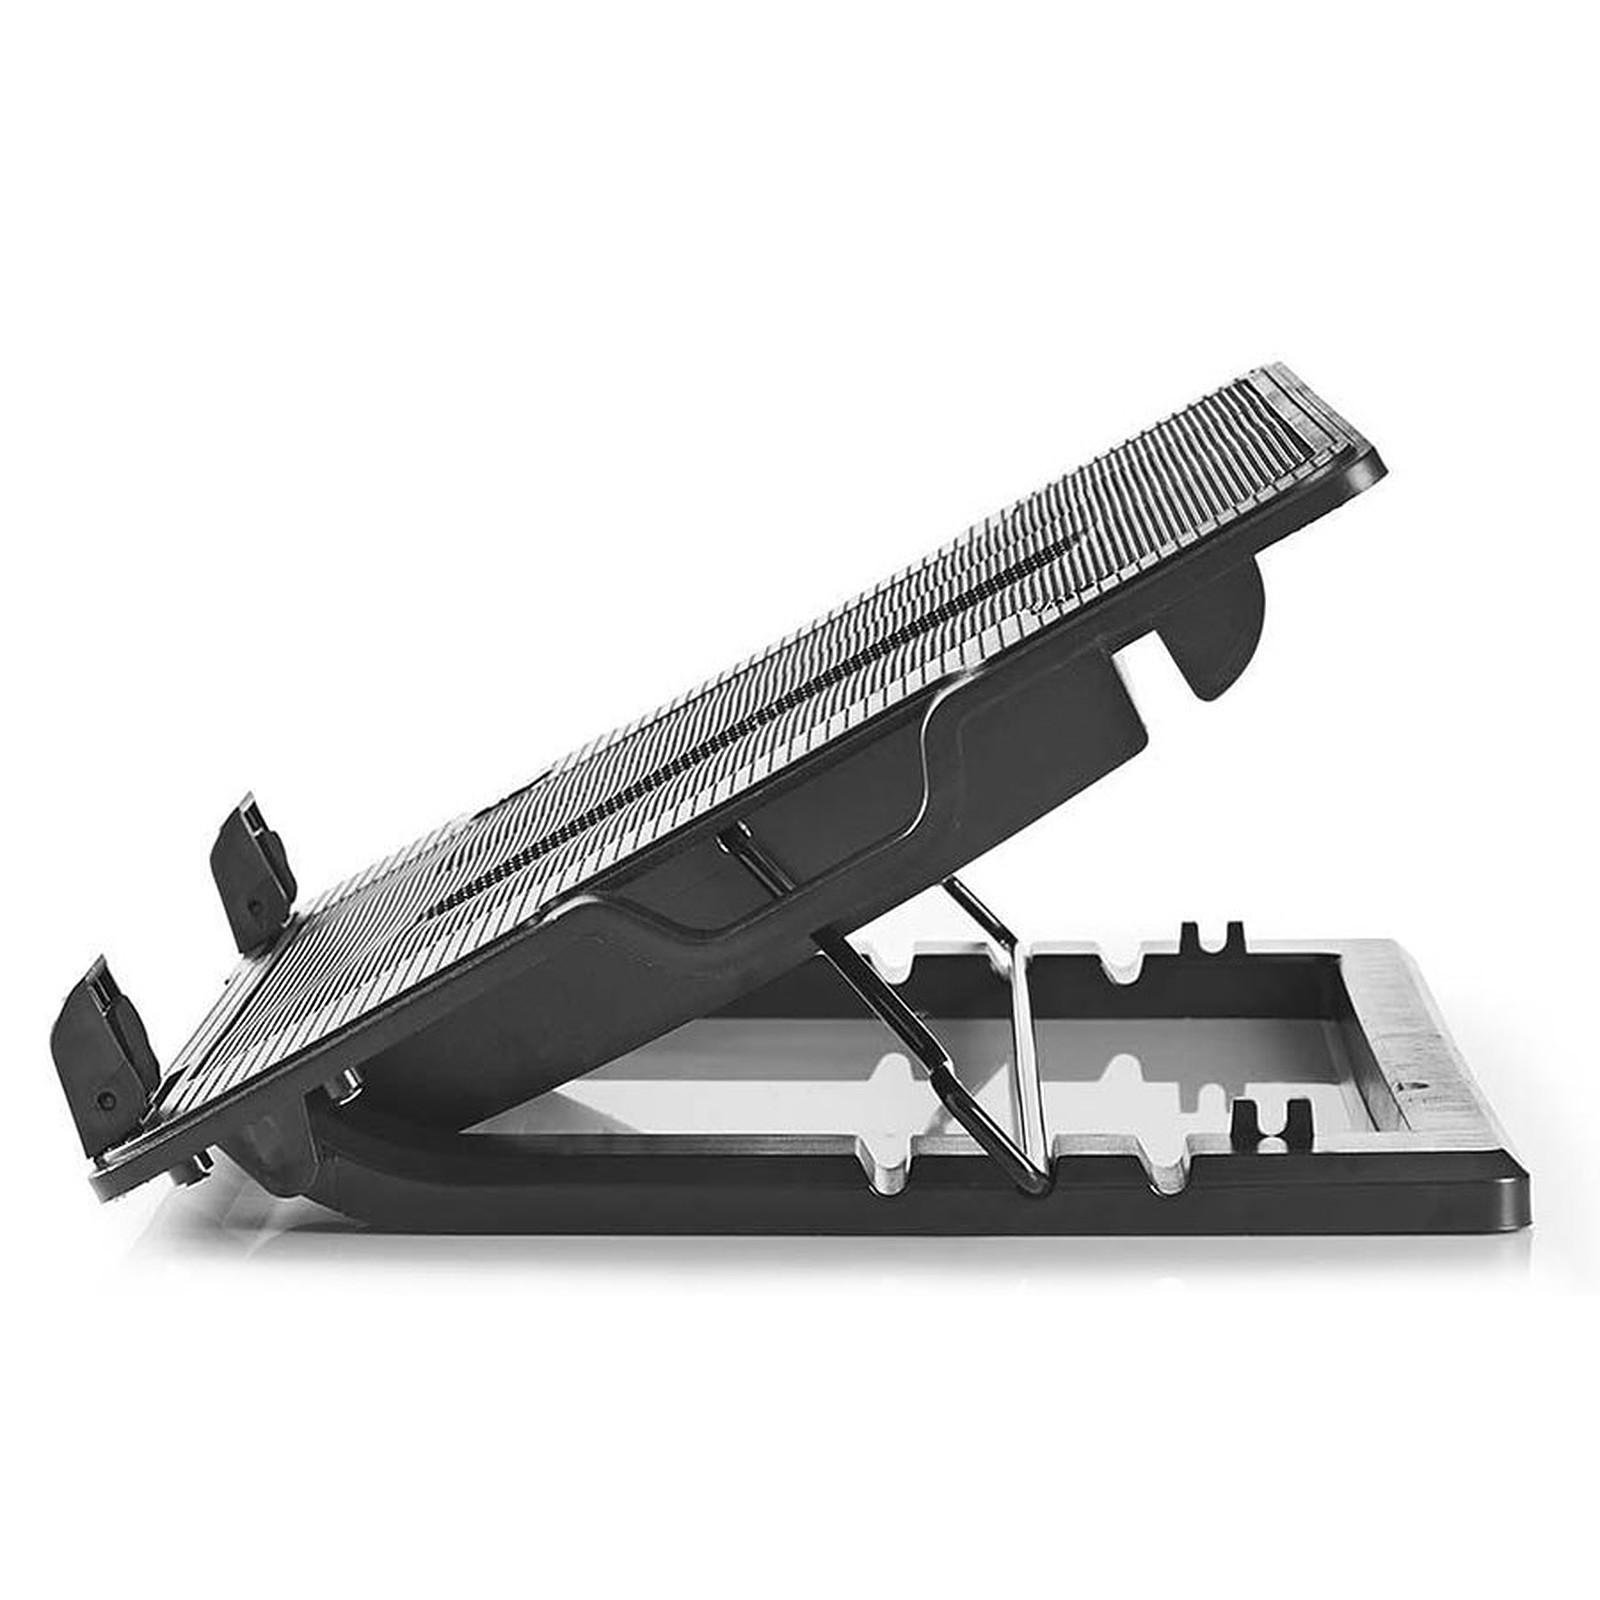 Nedis Notebook Cooler Stand